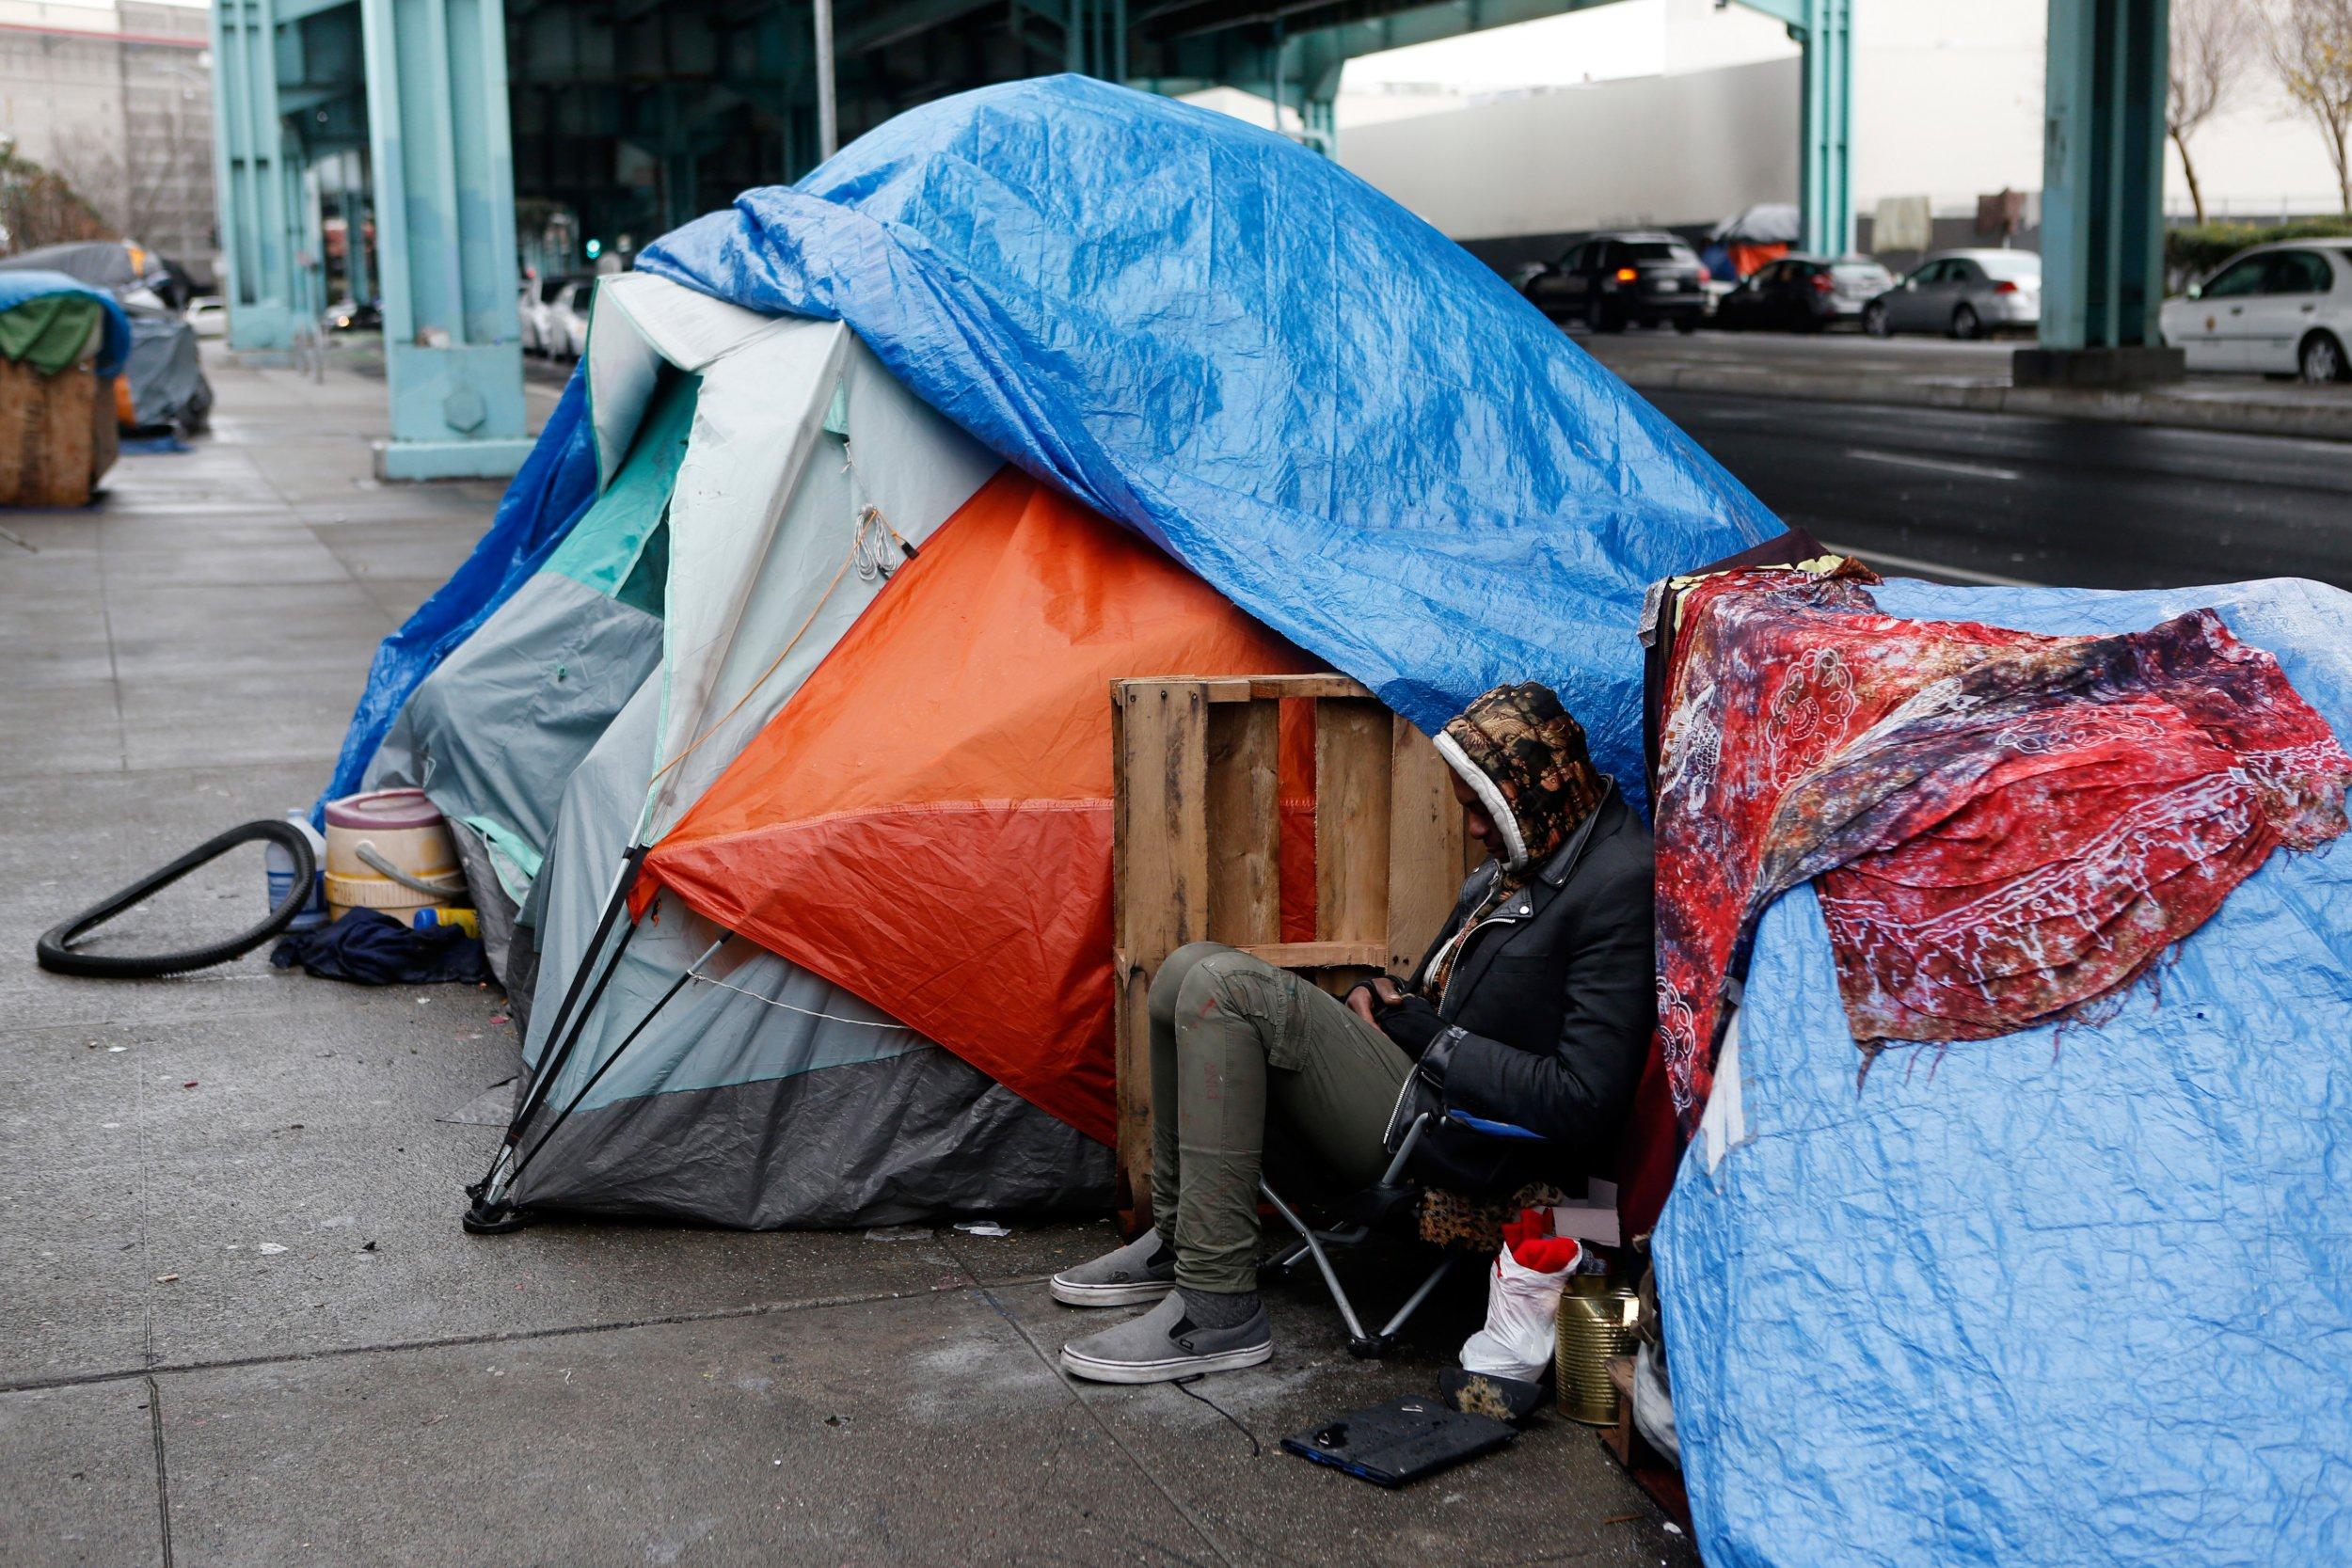 2-18-16 San Francisco homeless